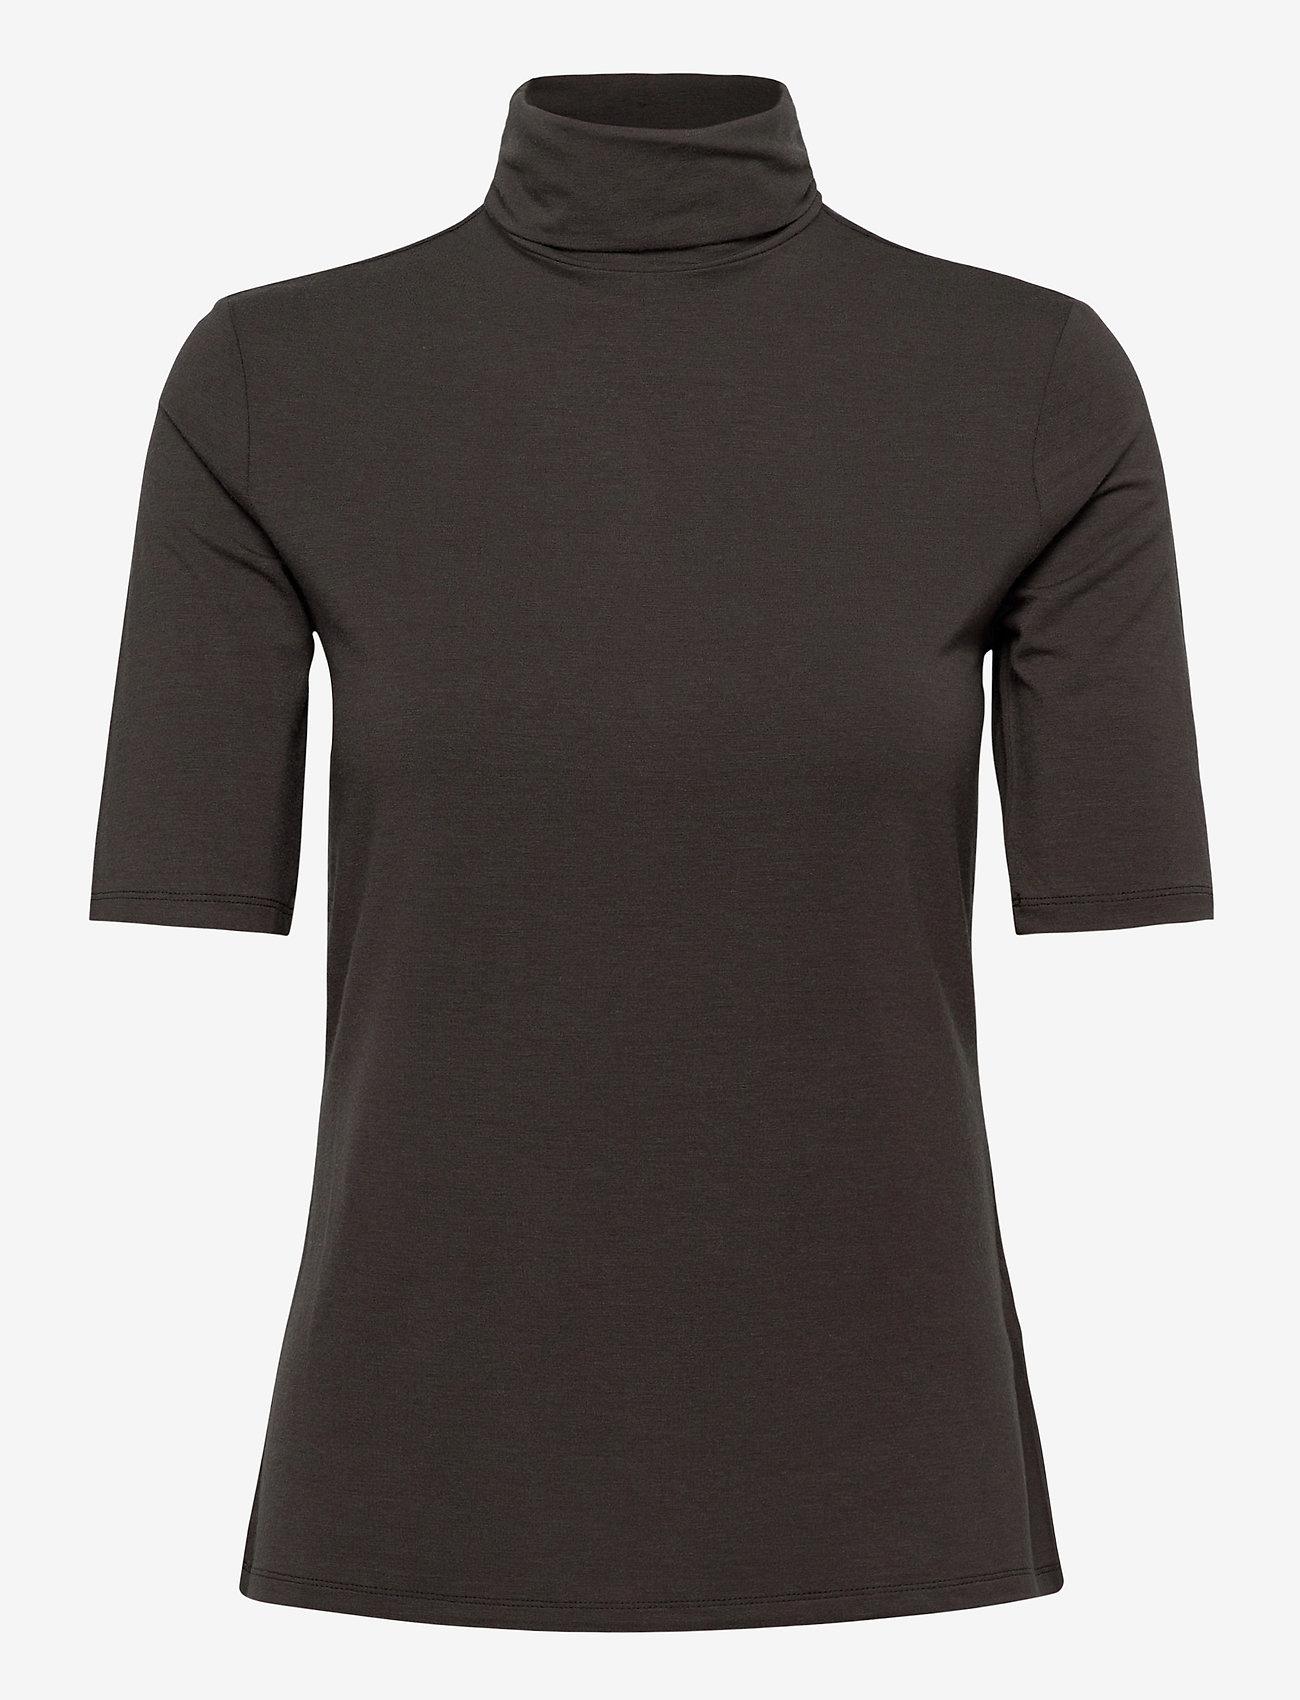 Esprit Collection - T-Shirts - t-shirts - gunmetal 5 - 0